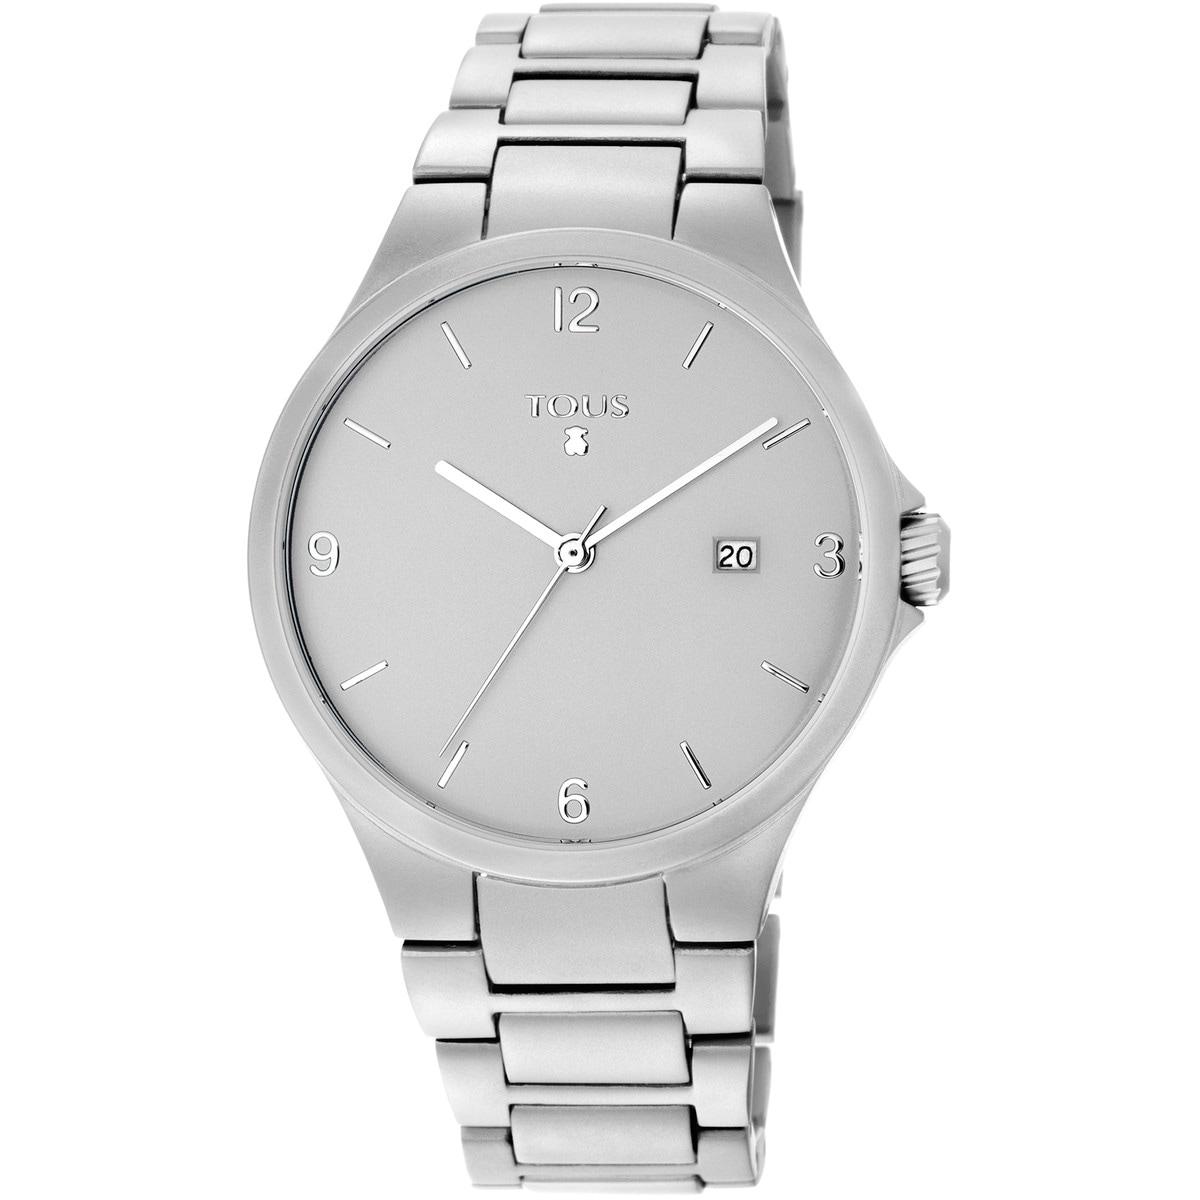 Reloj Motion Aluminio de aluminio anodizado plateado